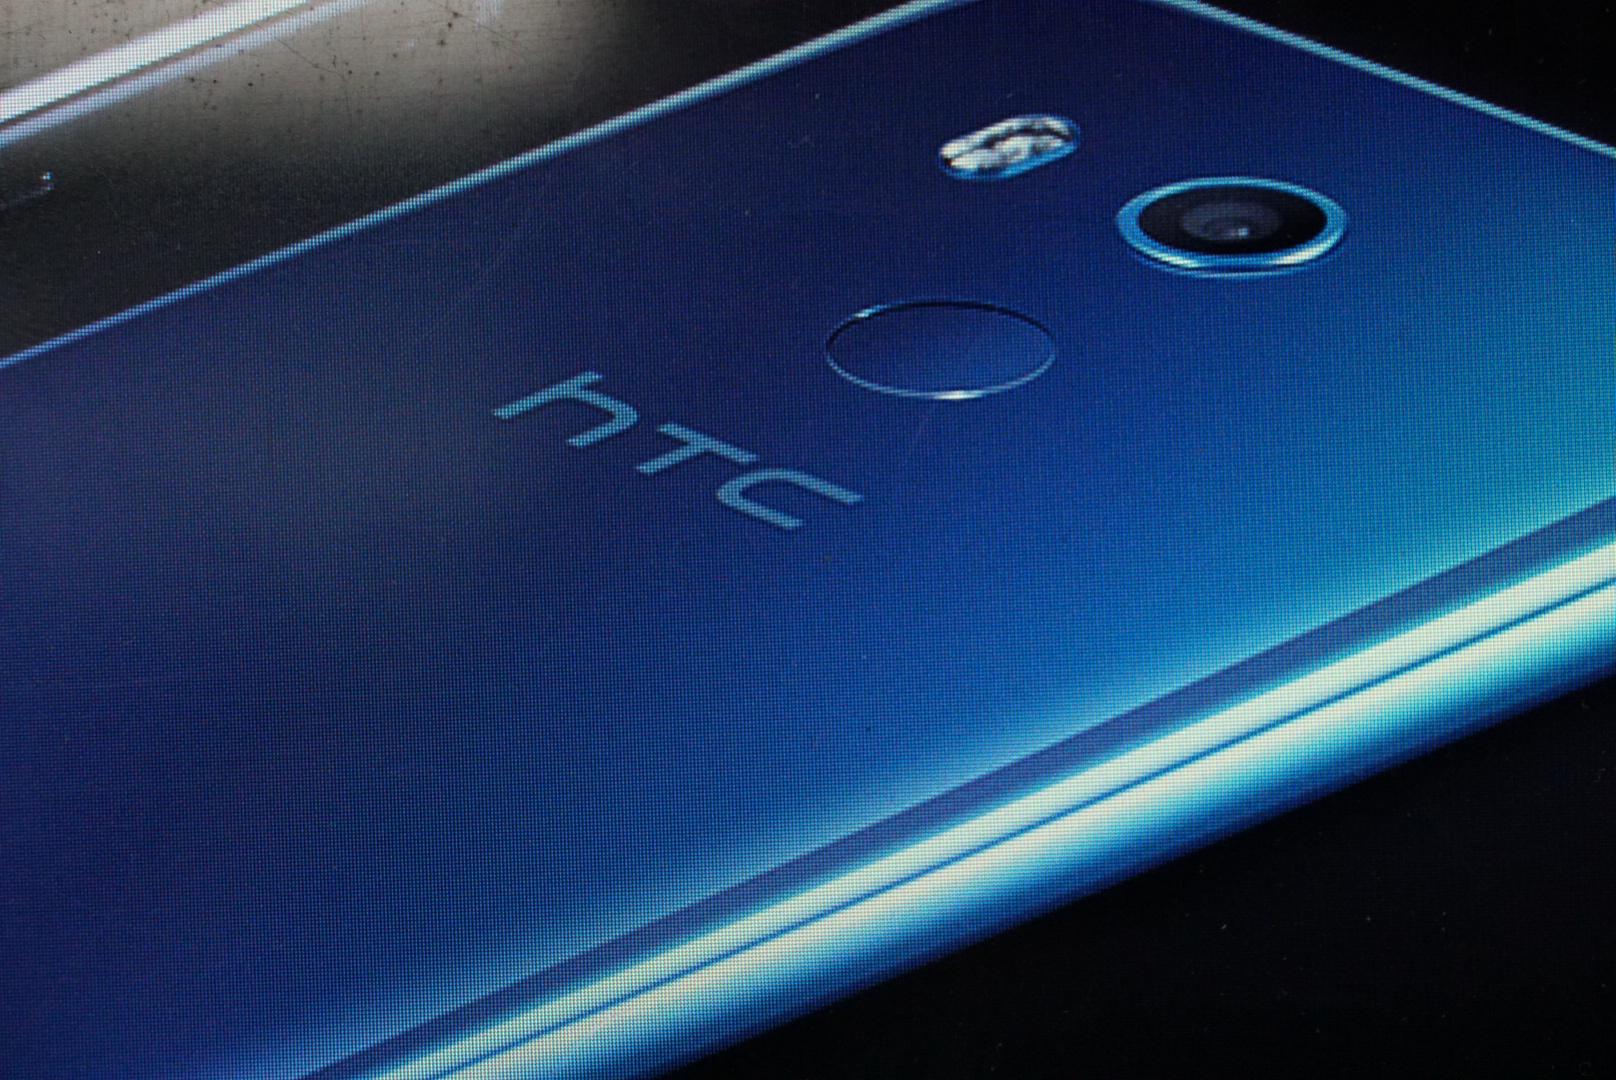 HTC王雪红:明年HTC会非常好